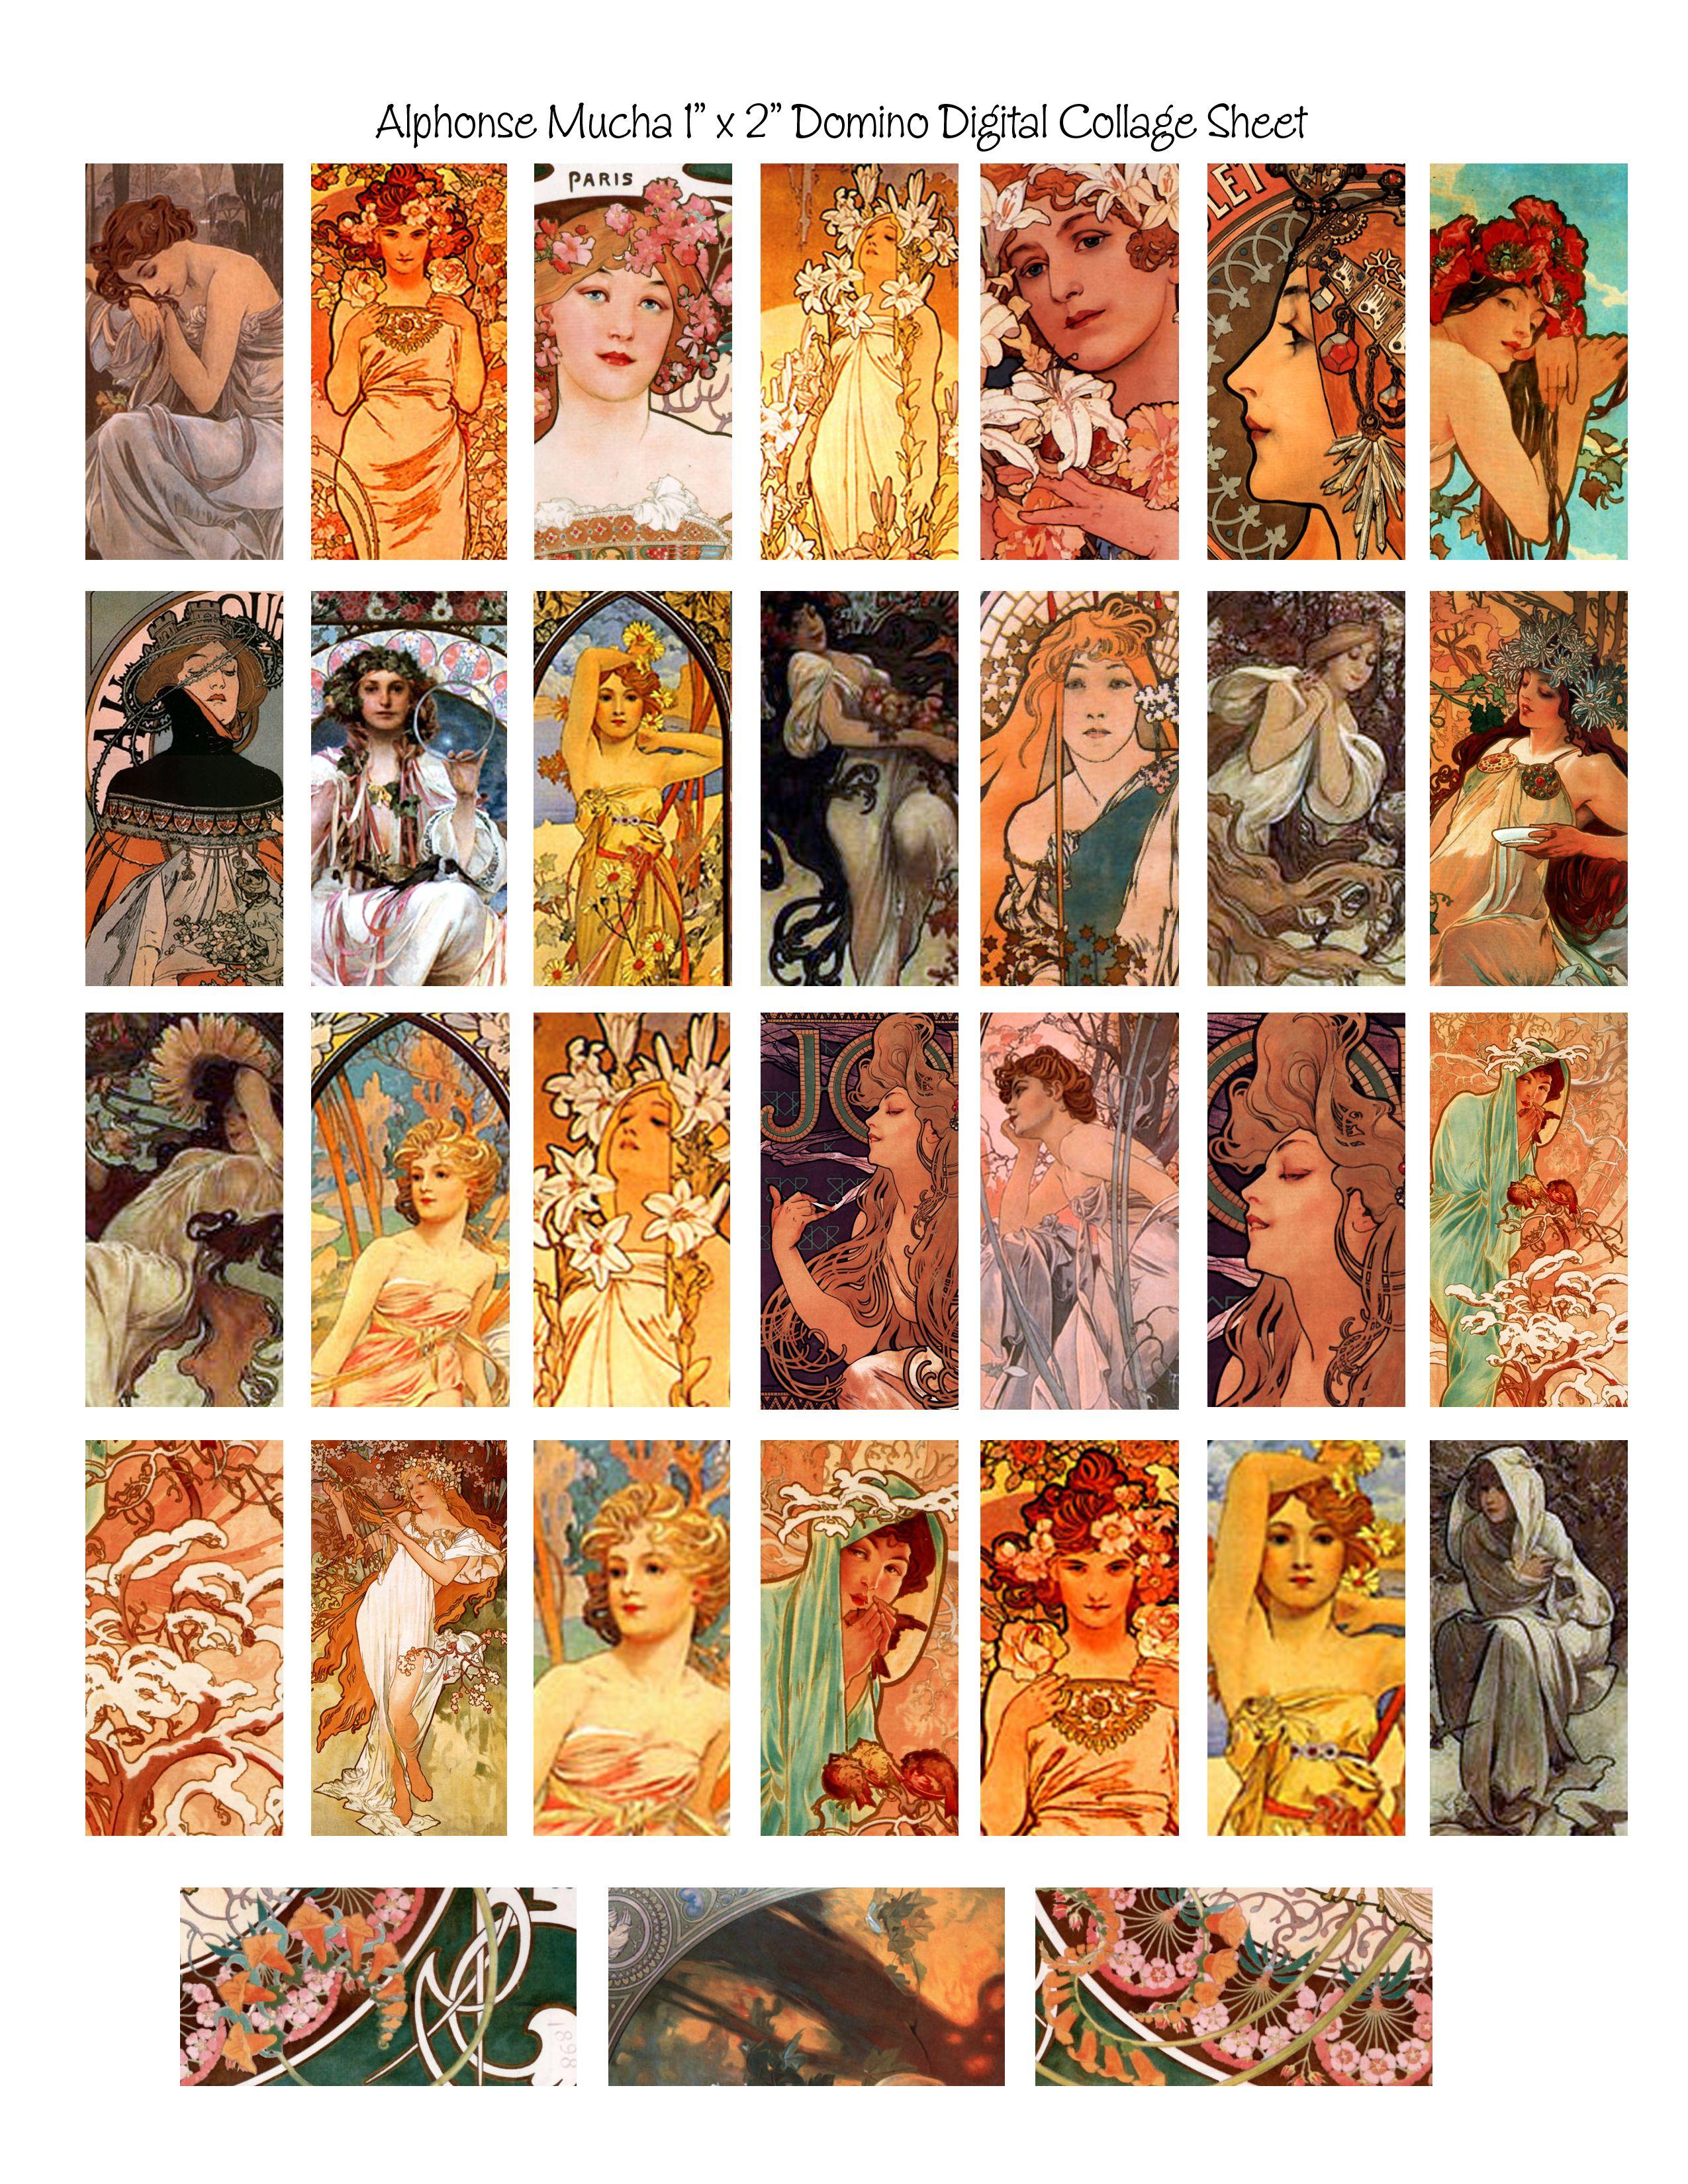 Free Domino Alphonse Mucha Digital Collage Free Download - Free Printable Digital Collage Sheets